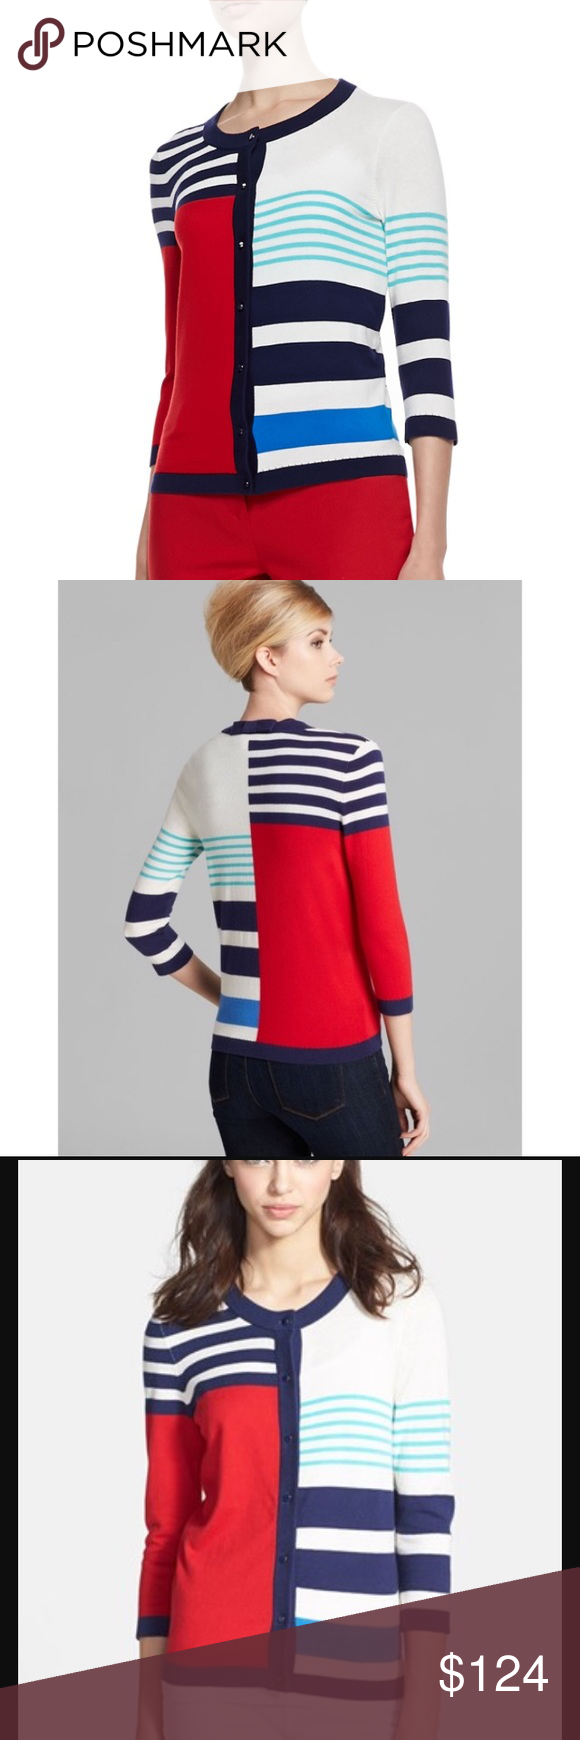 ♠️️ KATE SPADE ♠️️ Ollie Cardigan Super cute and fun! kate spade Sweaters Cardigans